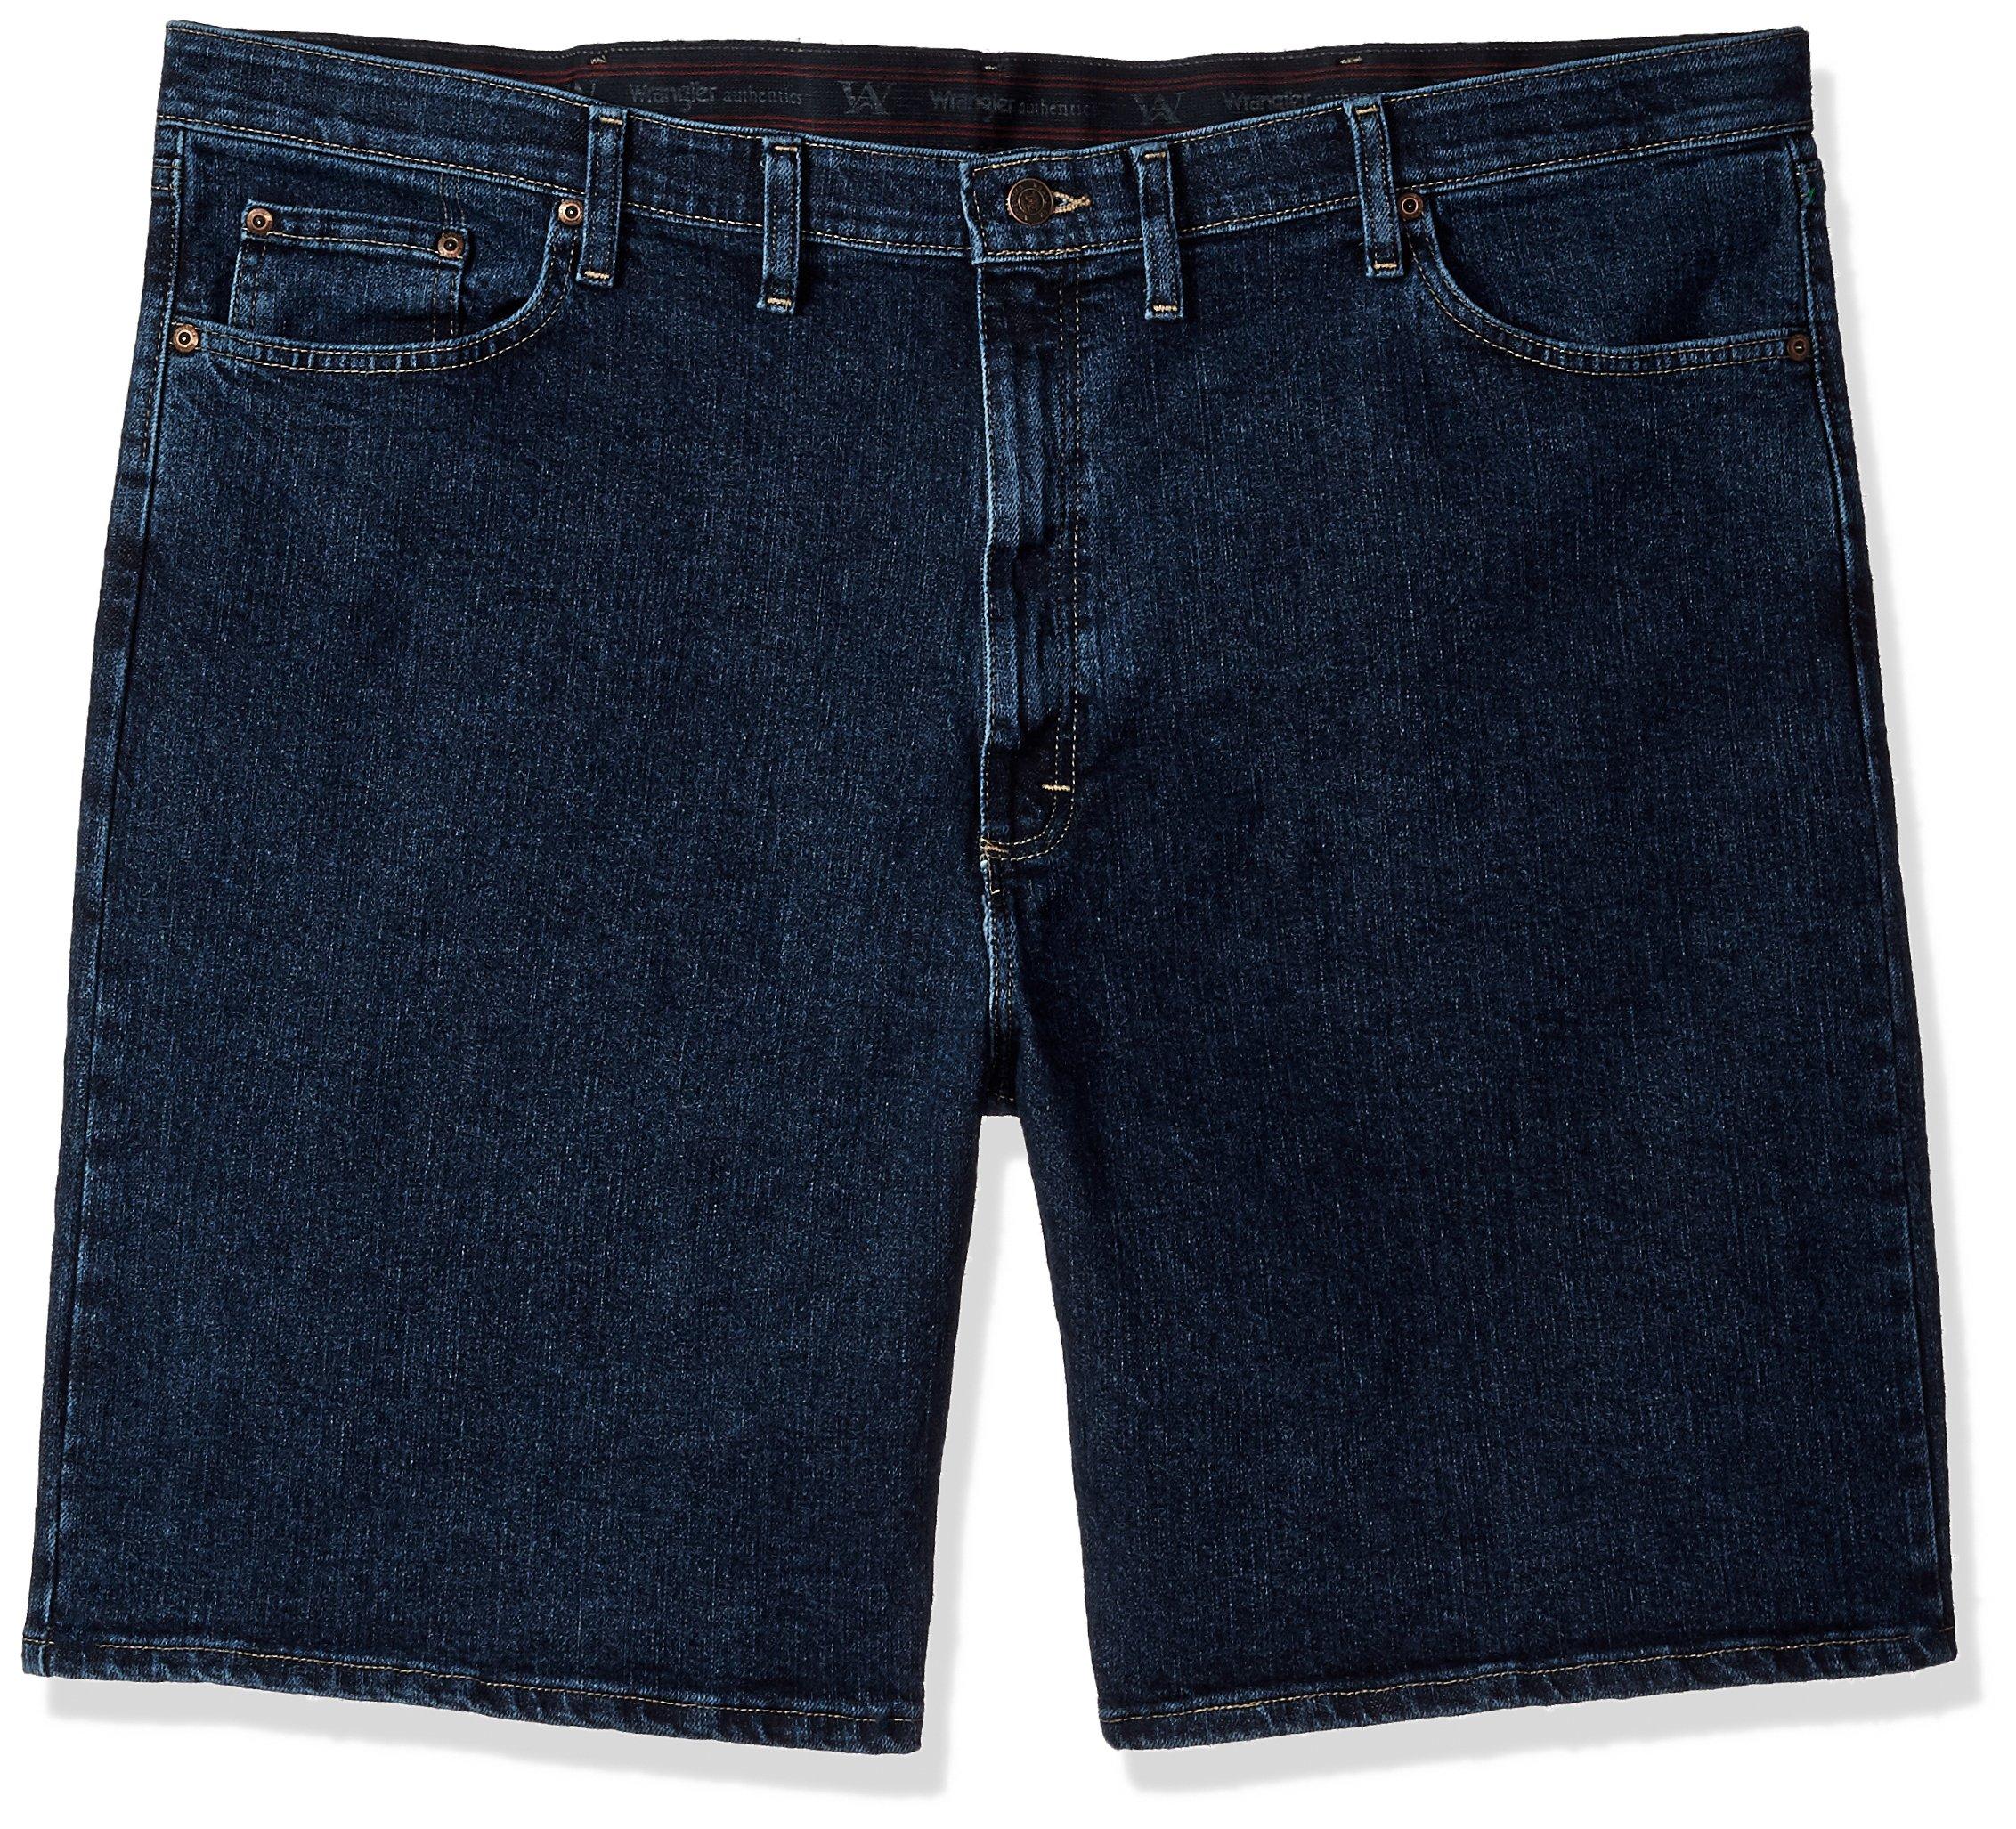 Wrangler Men's Big and Tall Authentics Comfort Flex Denim Short, Dark Stonewash, 48